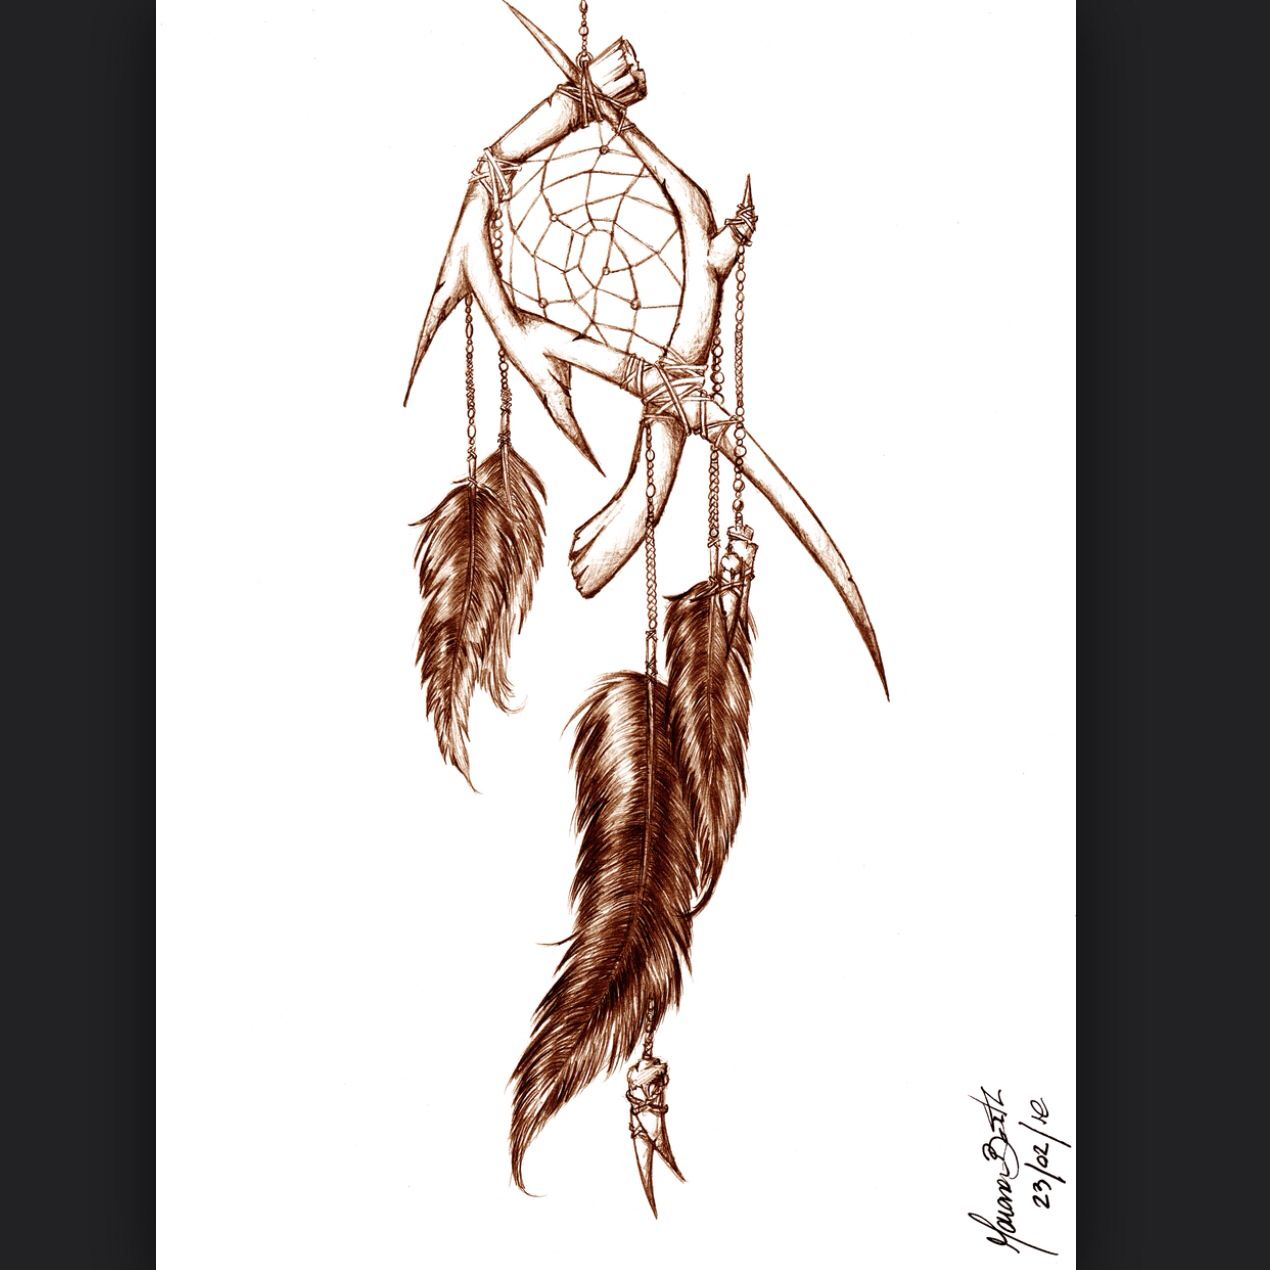 In love :) dream catcher tattoo I think I would put ...